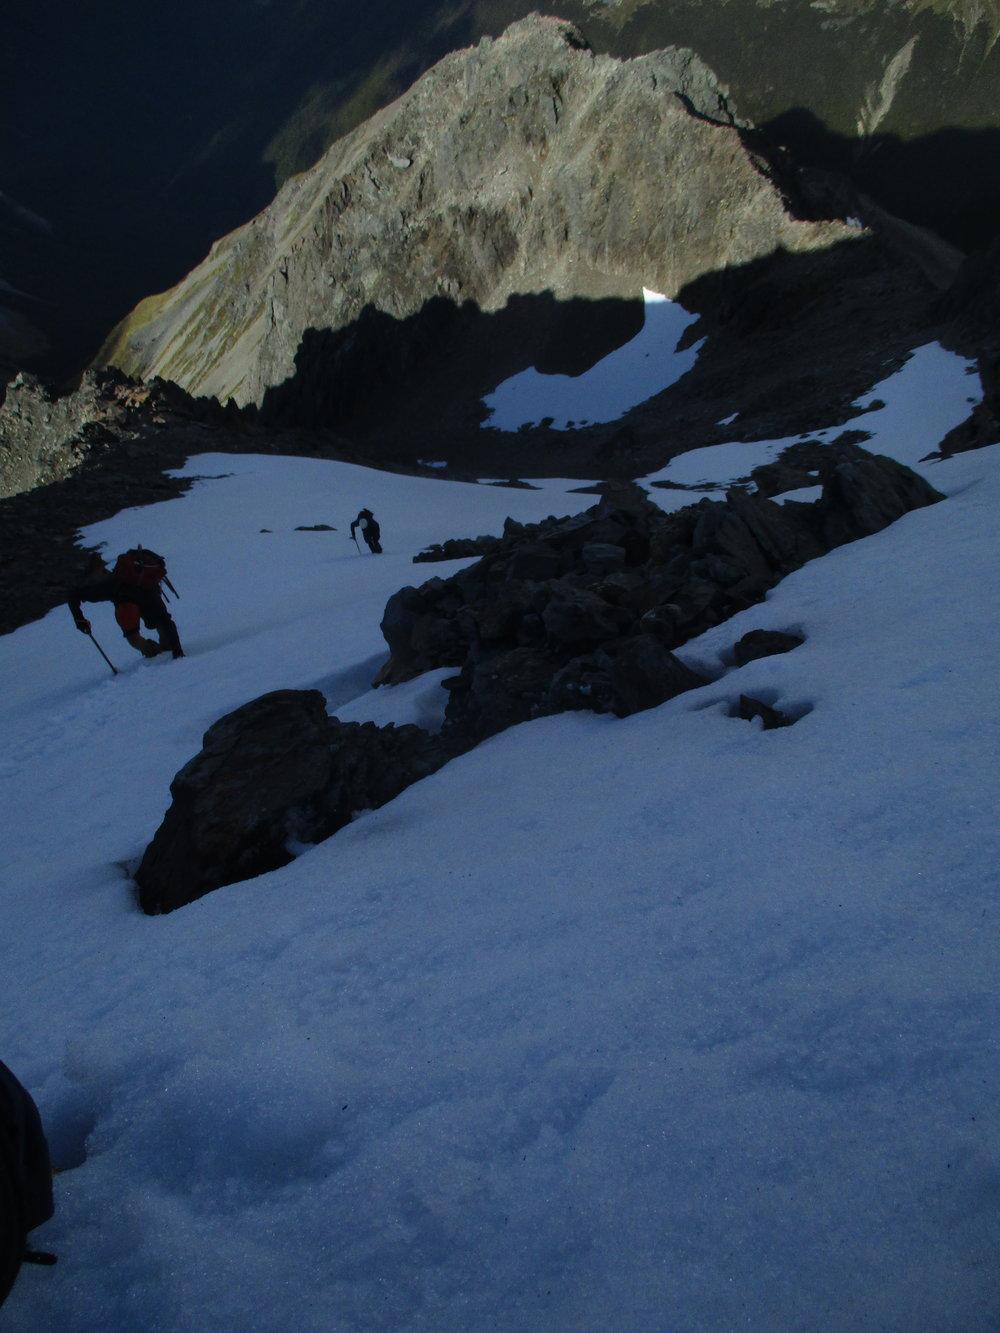 Bill and Jono on Mount Travers